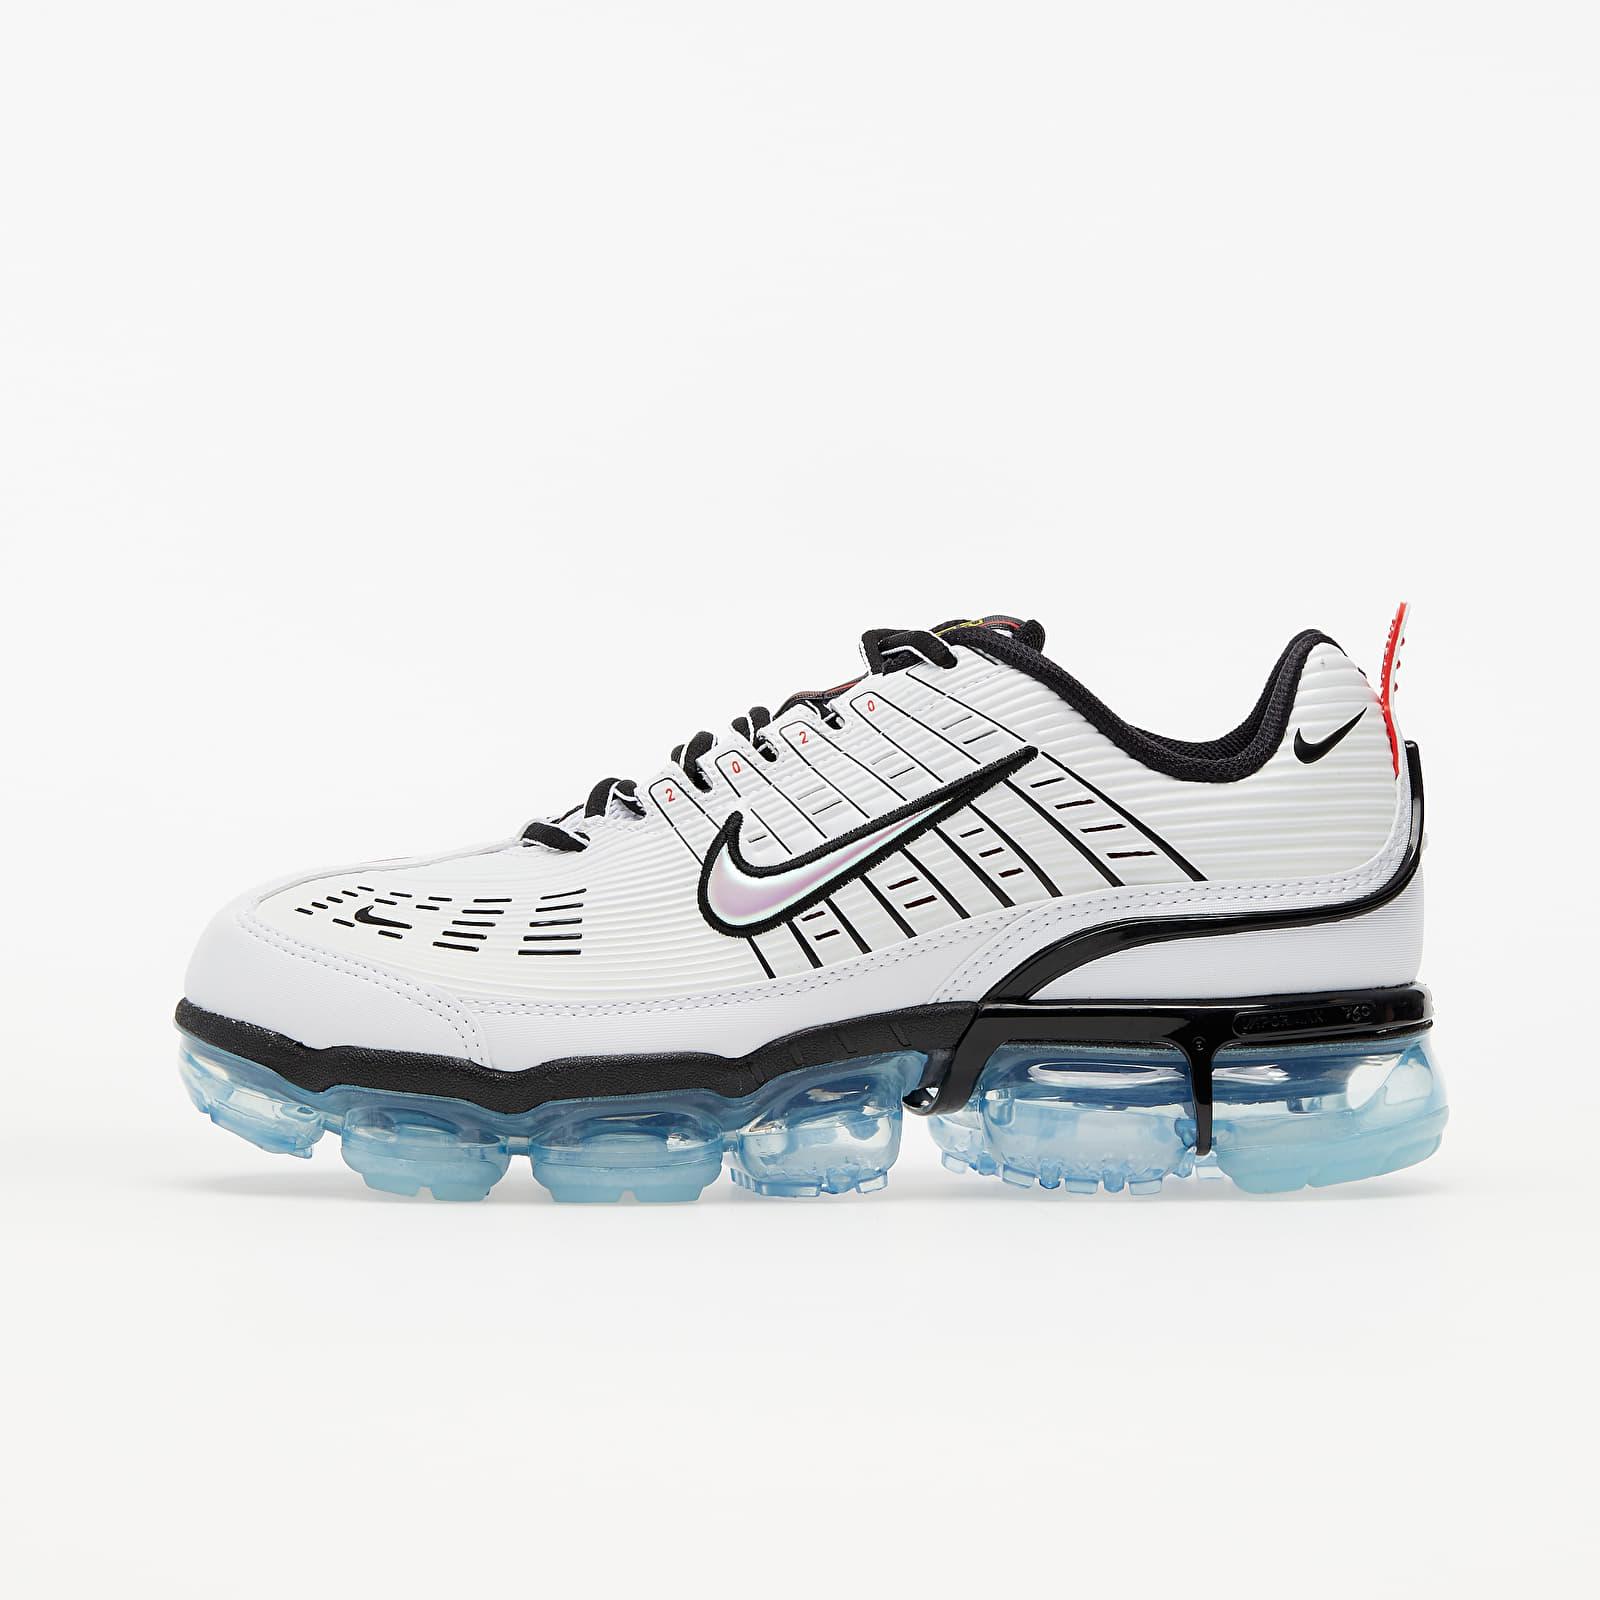 Men's shoes Nike Air Vapormax 360 White/ White-Black-Speed Yellow